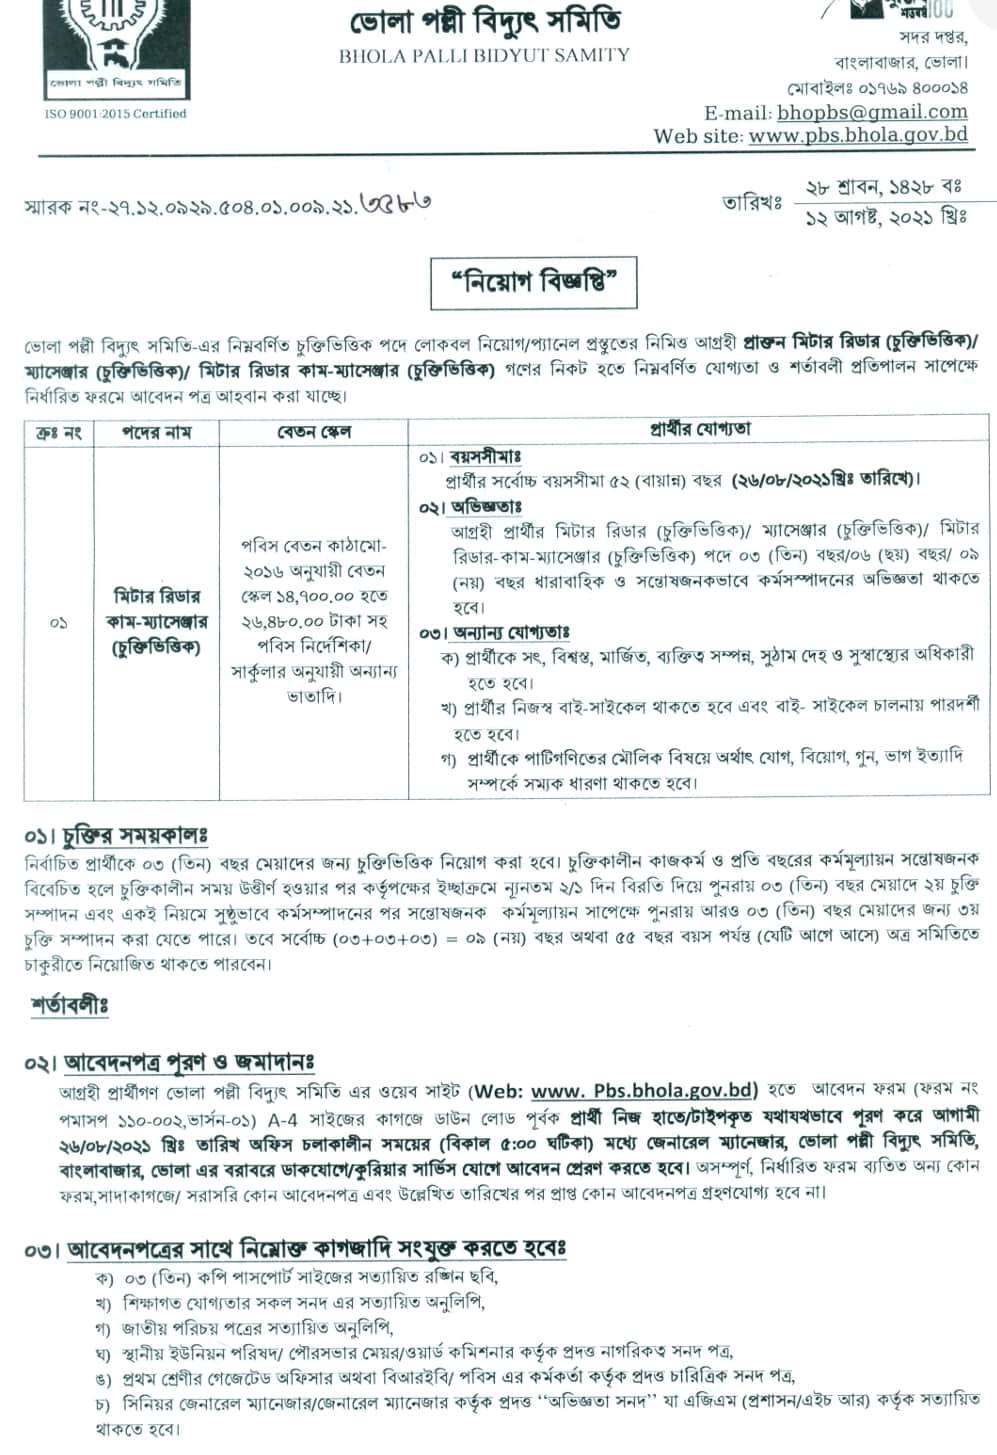 https://bdjobs24.net/wp-content/uploads/2021/08/Bangladesh-Rural-Electrification-Board-Job-Circular-2021-12.jpg